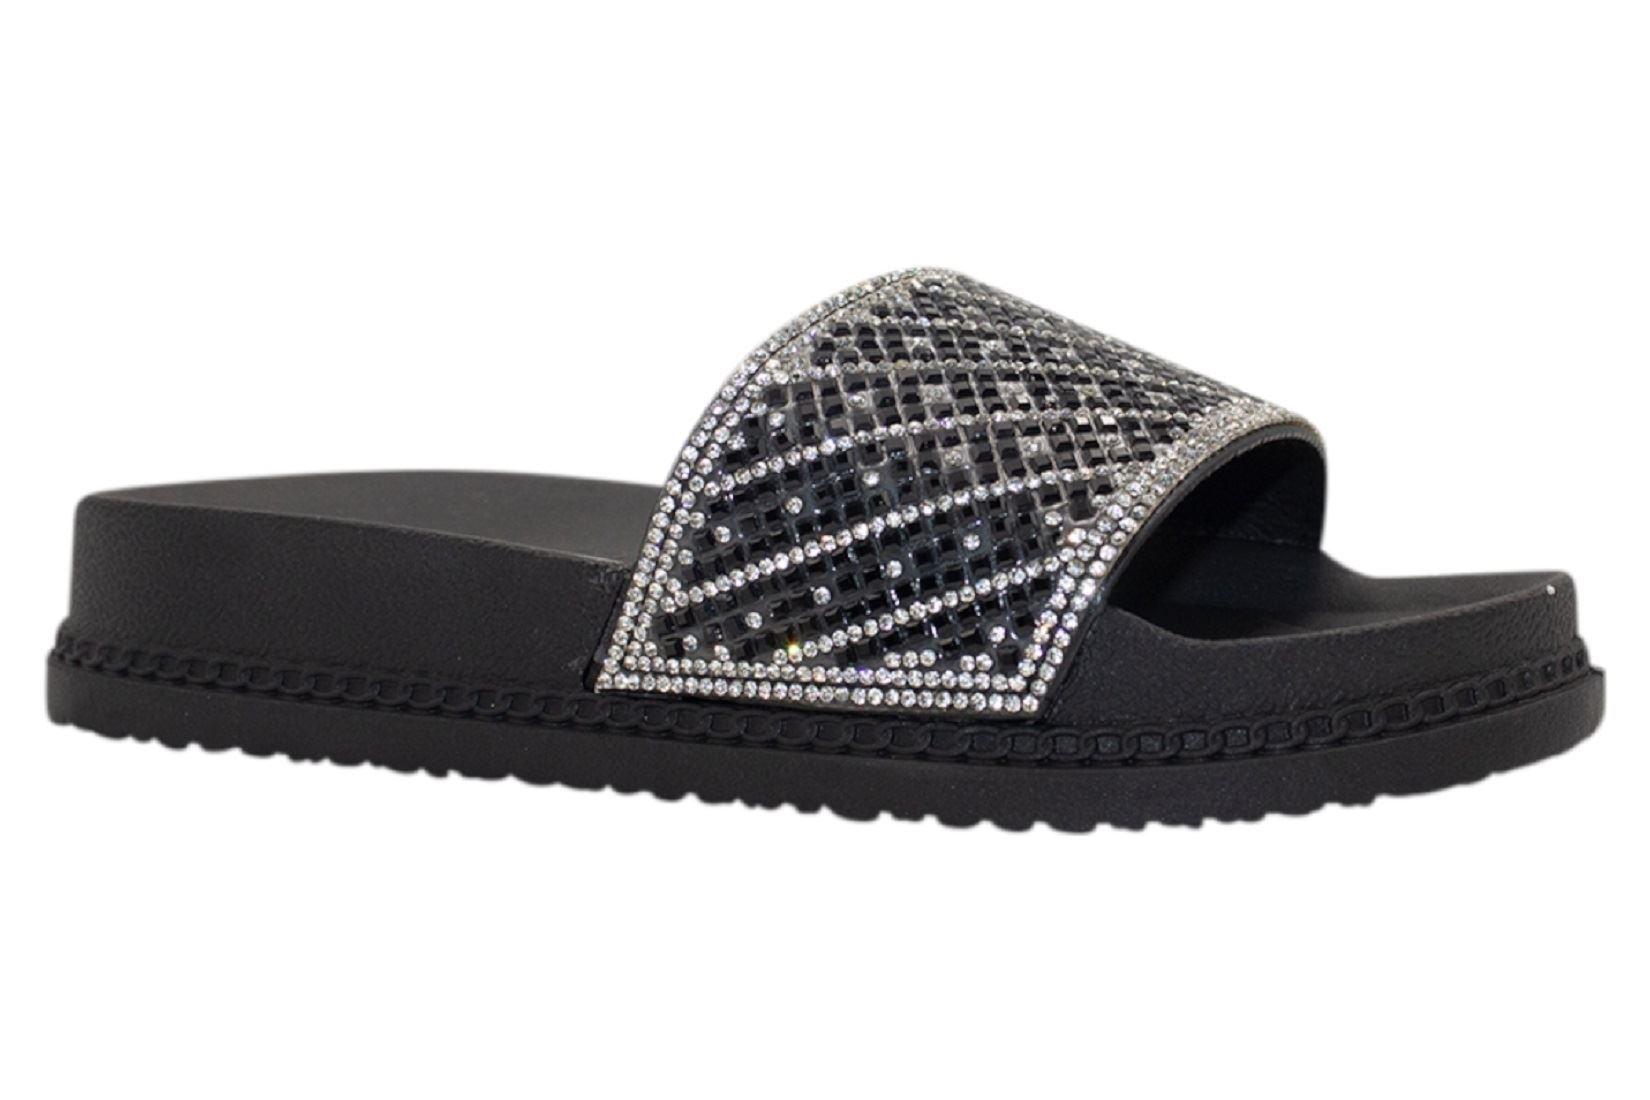 Womens-Sliders-Casual-Slippers-Mules-Ladies-Diamante-Flip-Flop-Sandals-Shoes thumbnail 79